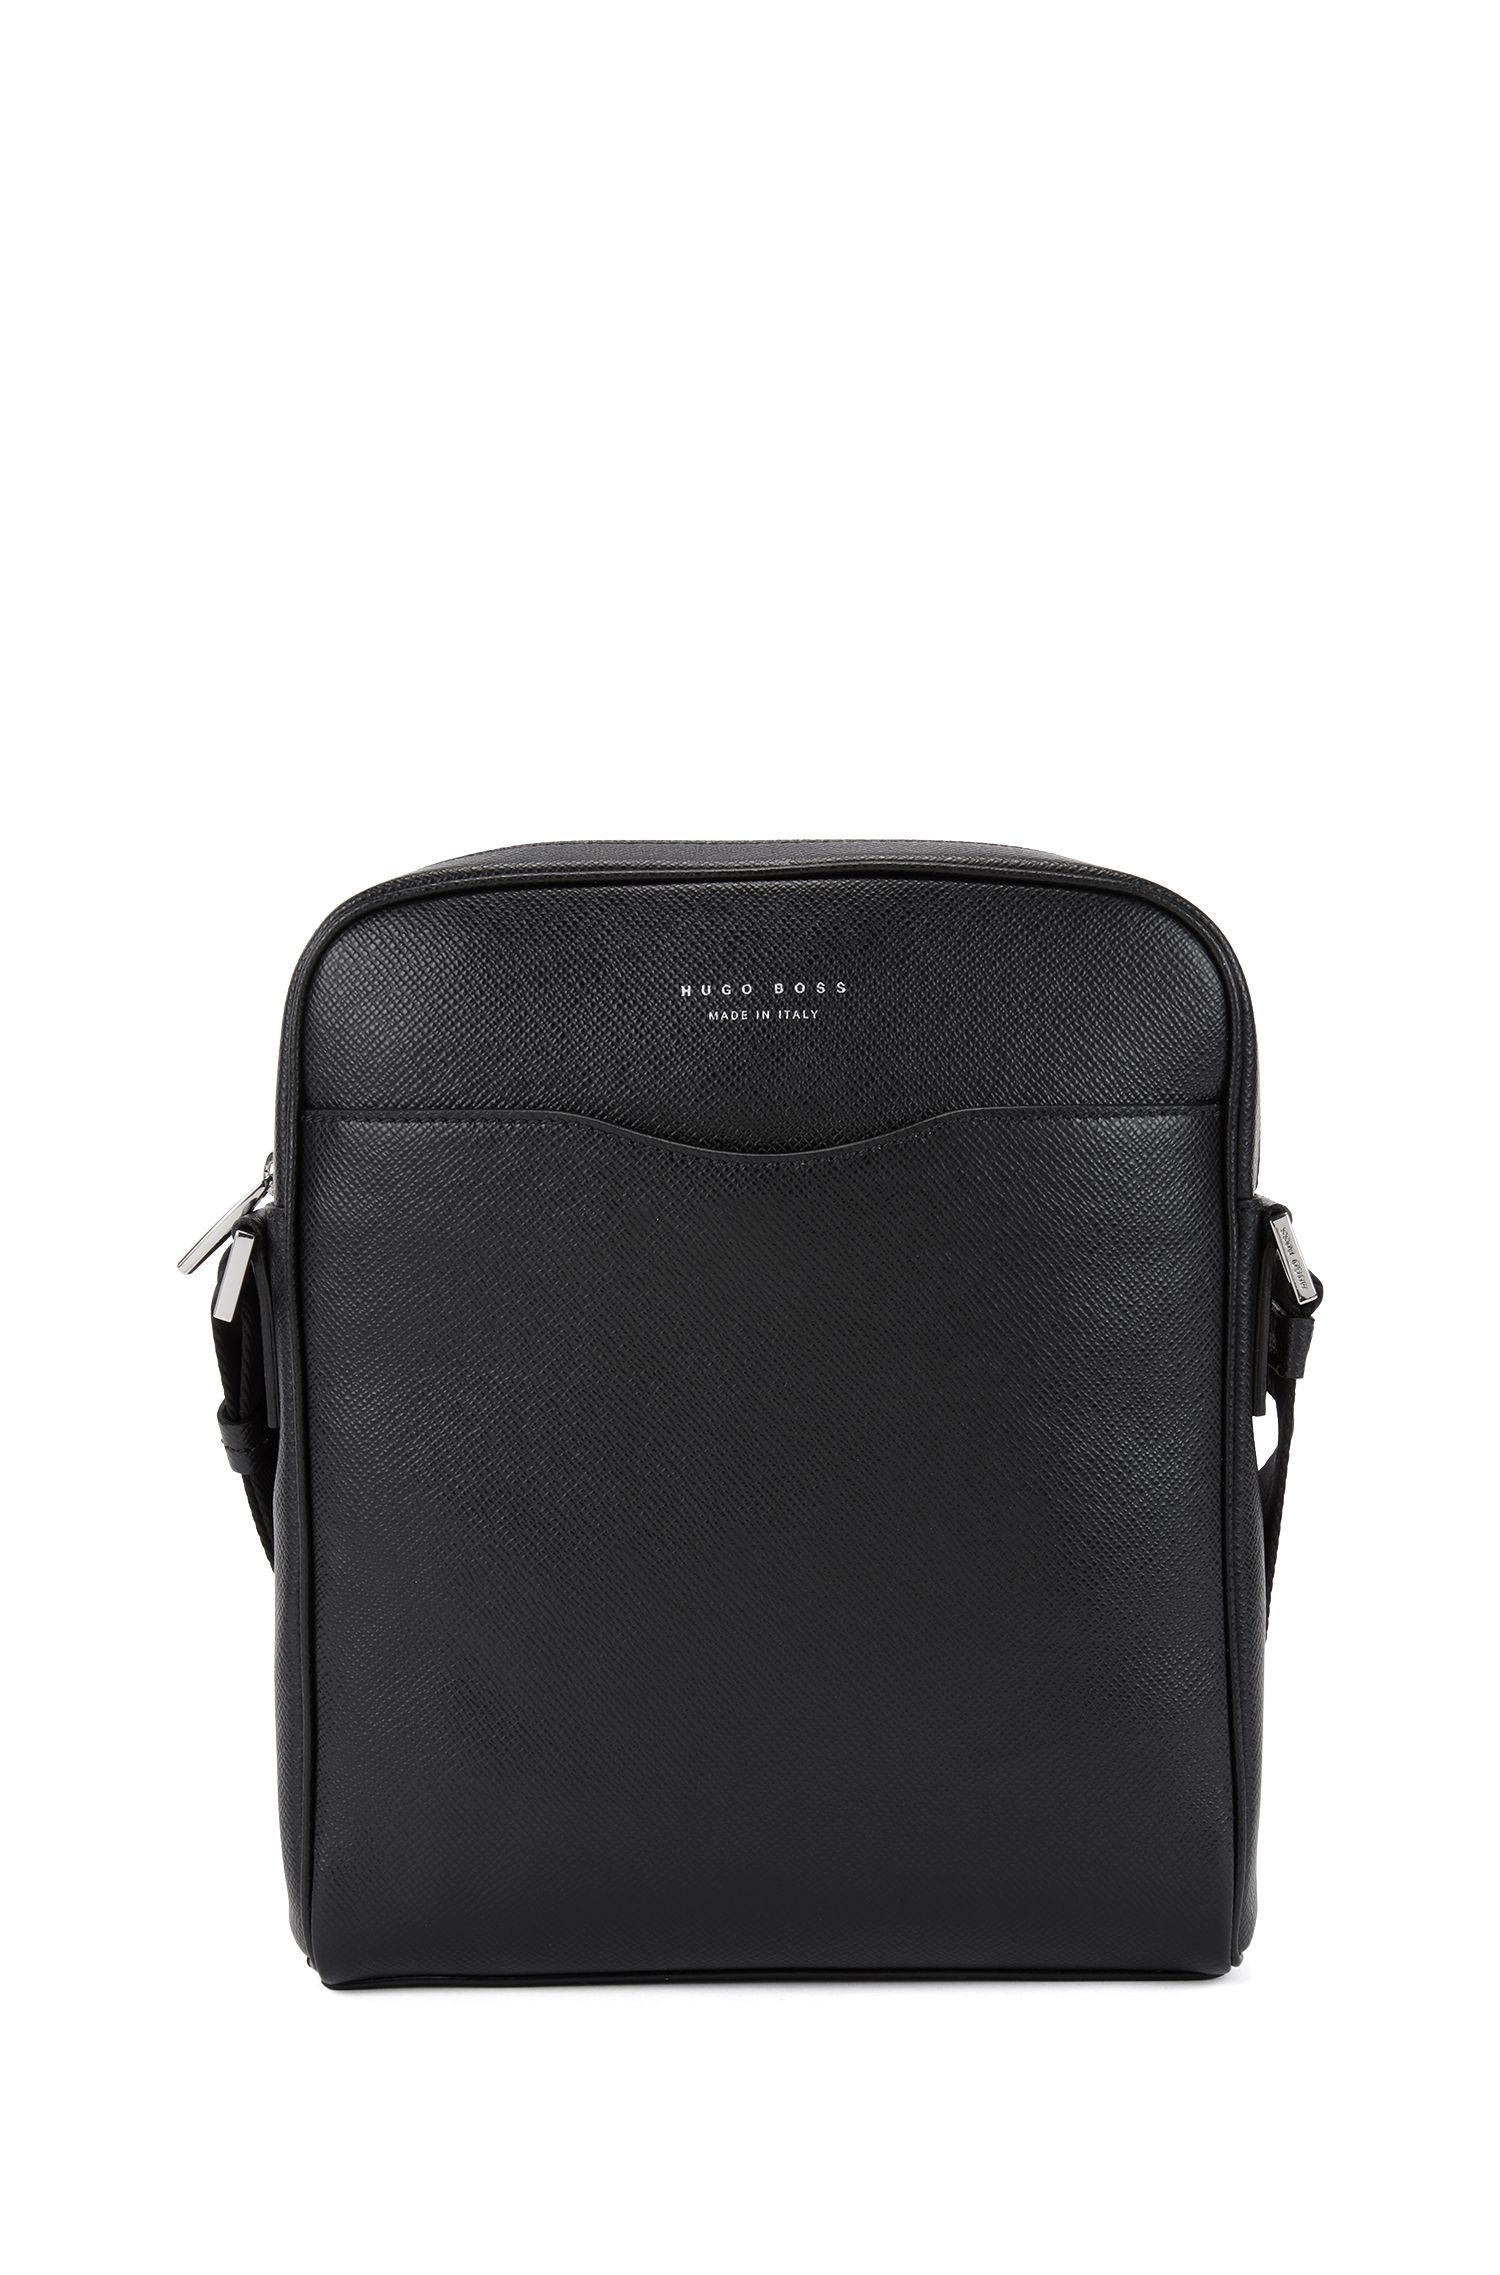 'Signature NS Zip' | Calfskin Reporter Bag, Shoulder Strap